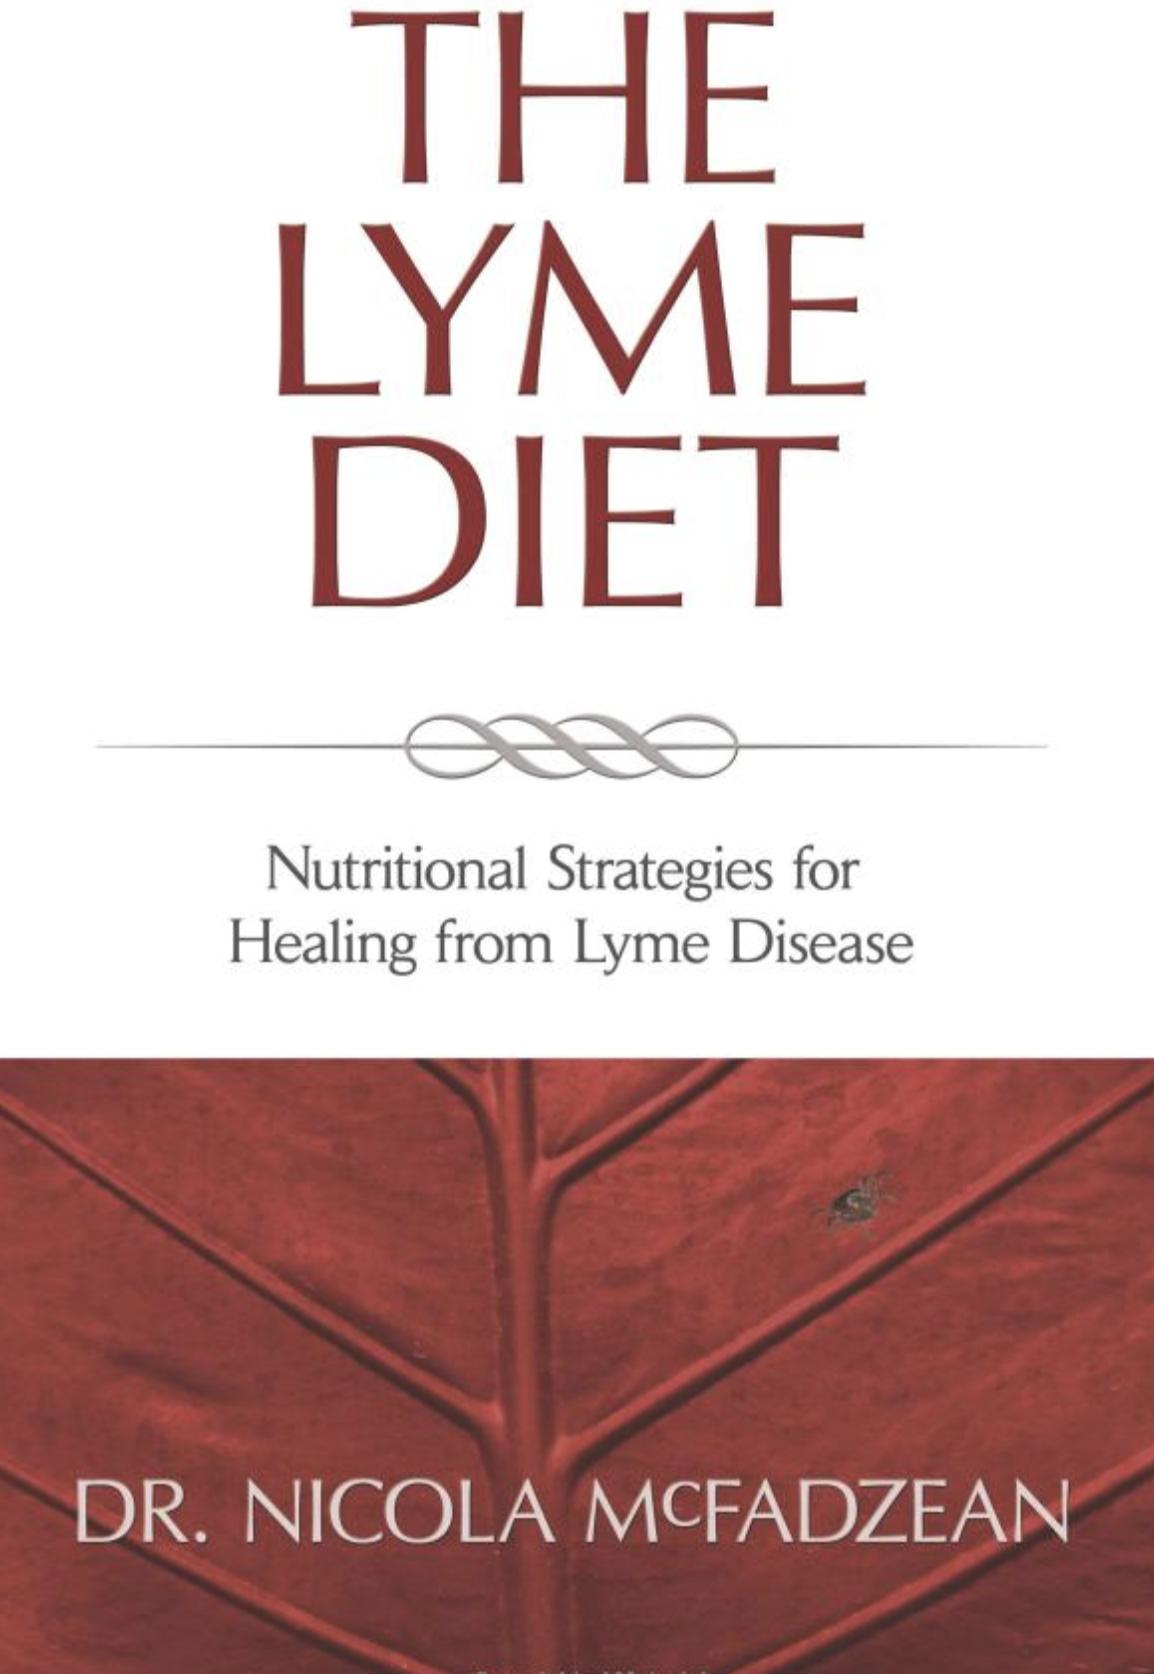 The Lyme Diet: Nutritional Strategies for Healing from Lyme Disease, By Nicola McFadzean ND